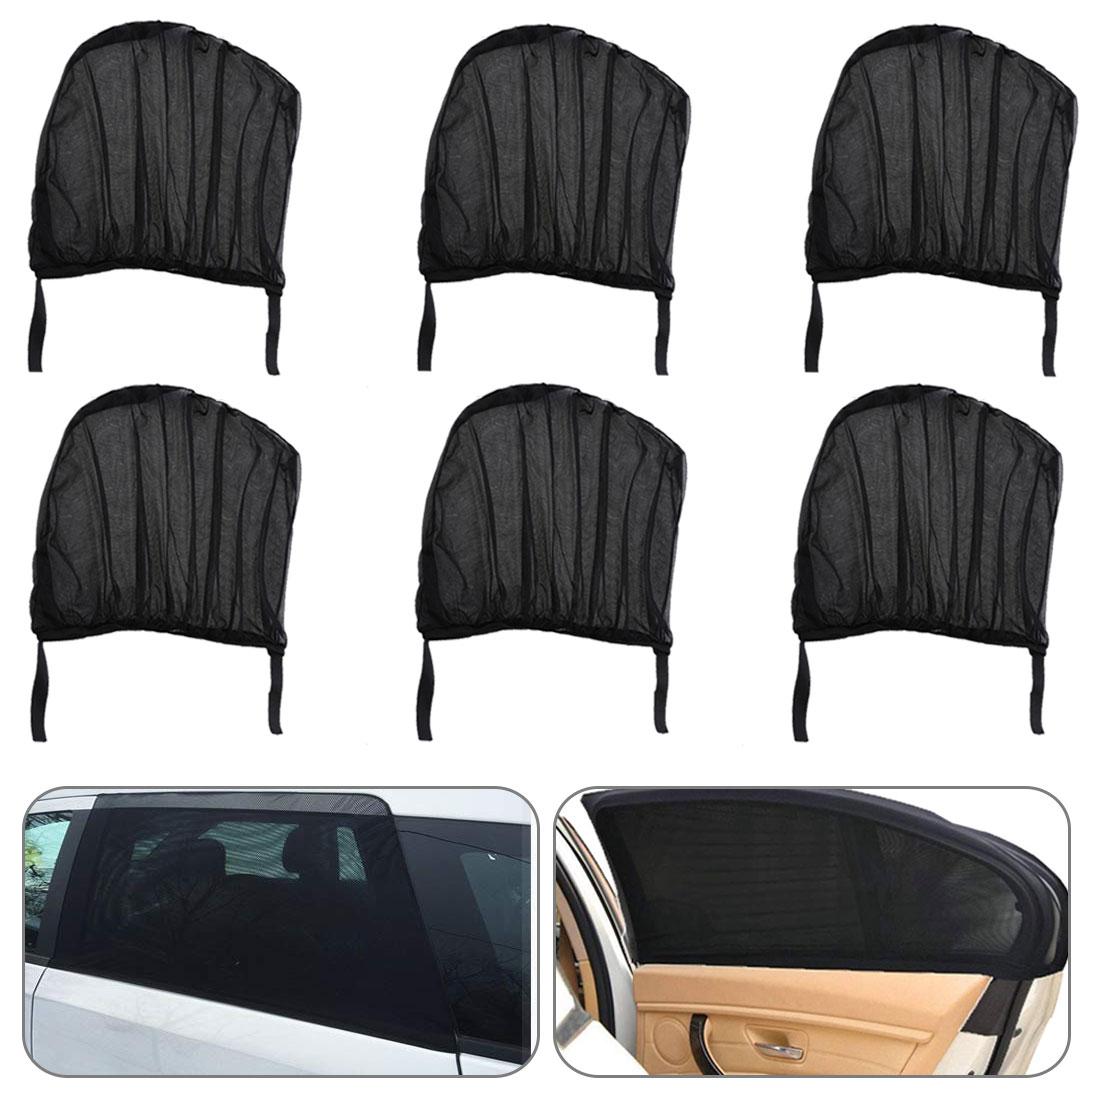 Car-Cover Visor-Shield Sun-Shade Window Black Auto 2pcs/Set Mesh Adjustable Rear